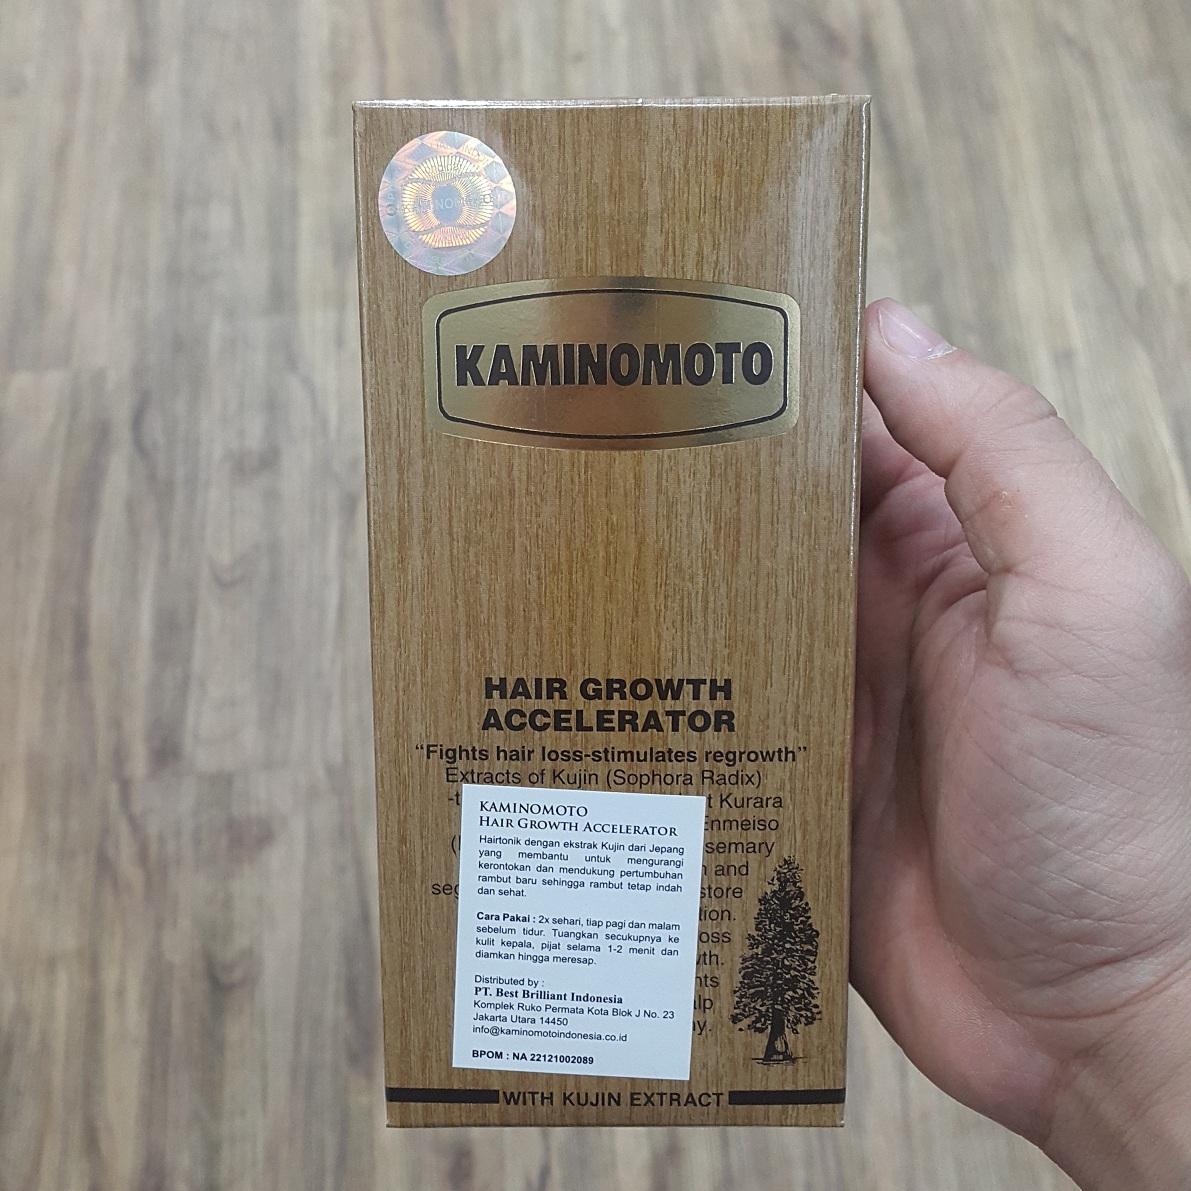 Kelebihan Kaminomoto Paket Hair Growth Accelerator Shampoo Terkini Tonic Original